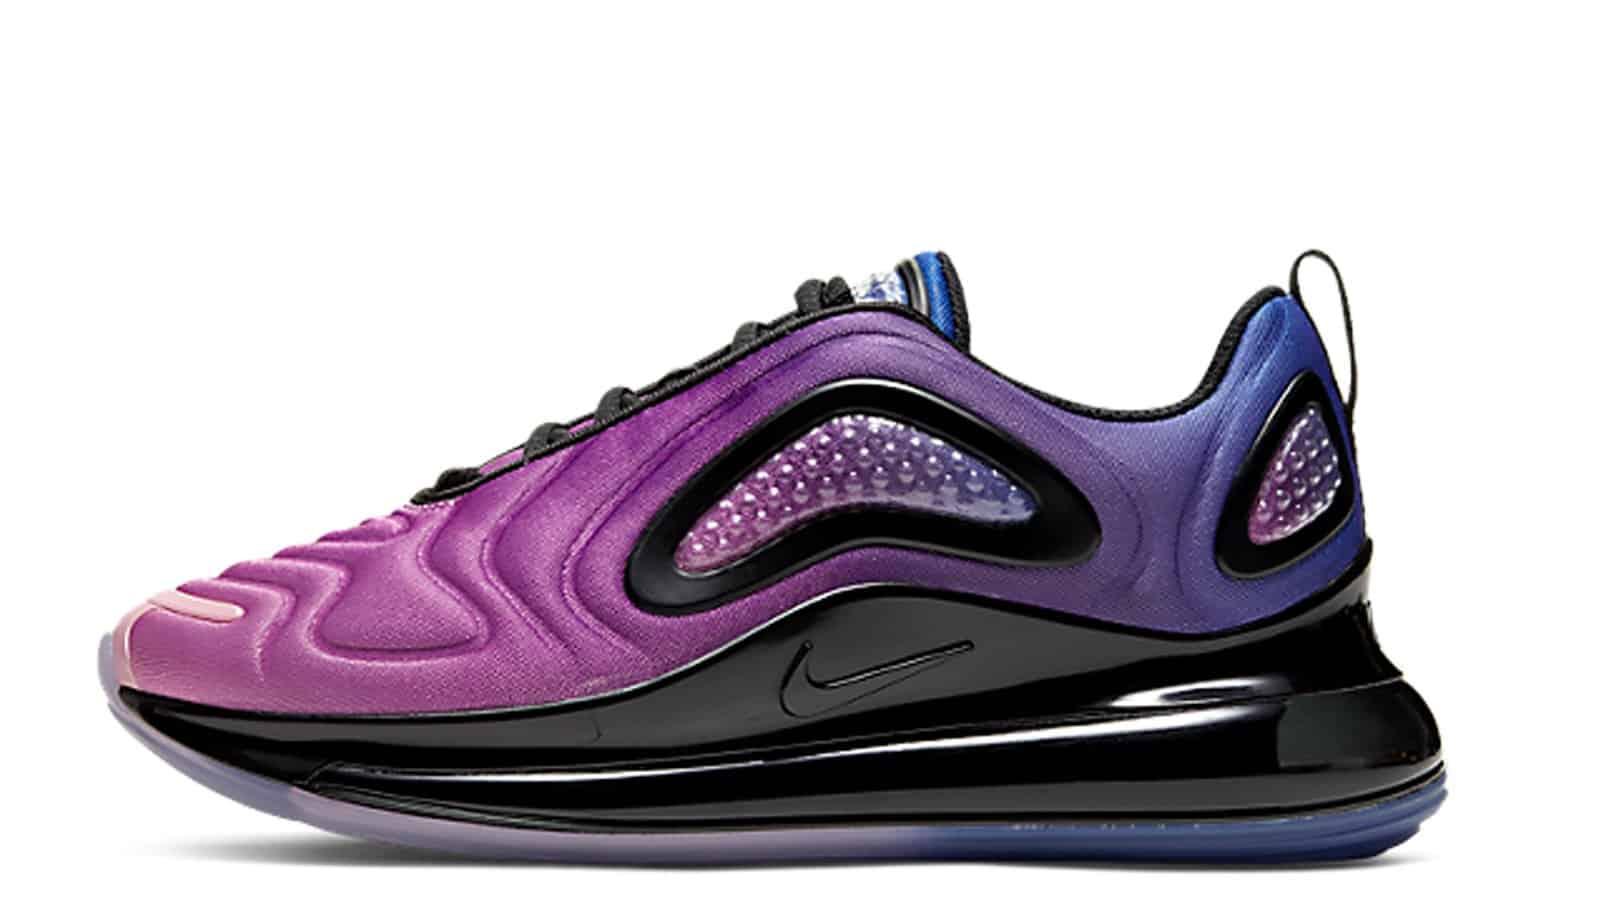 Nike Air Max 720 Bubbles Purple